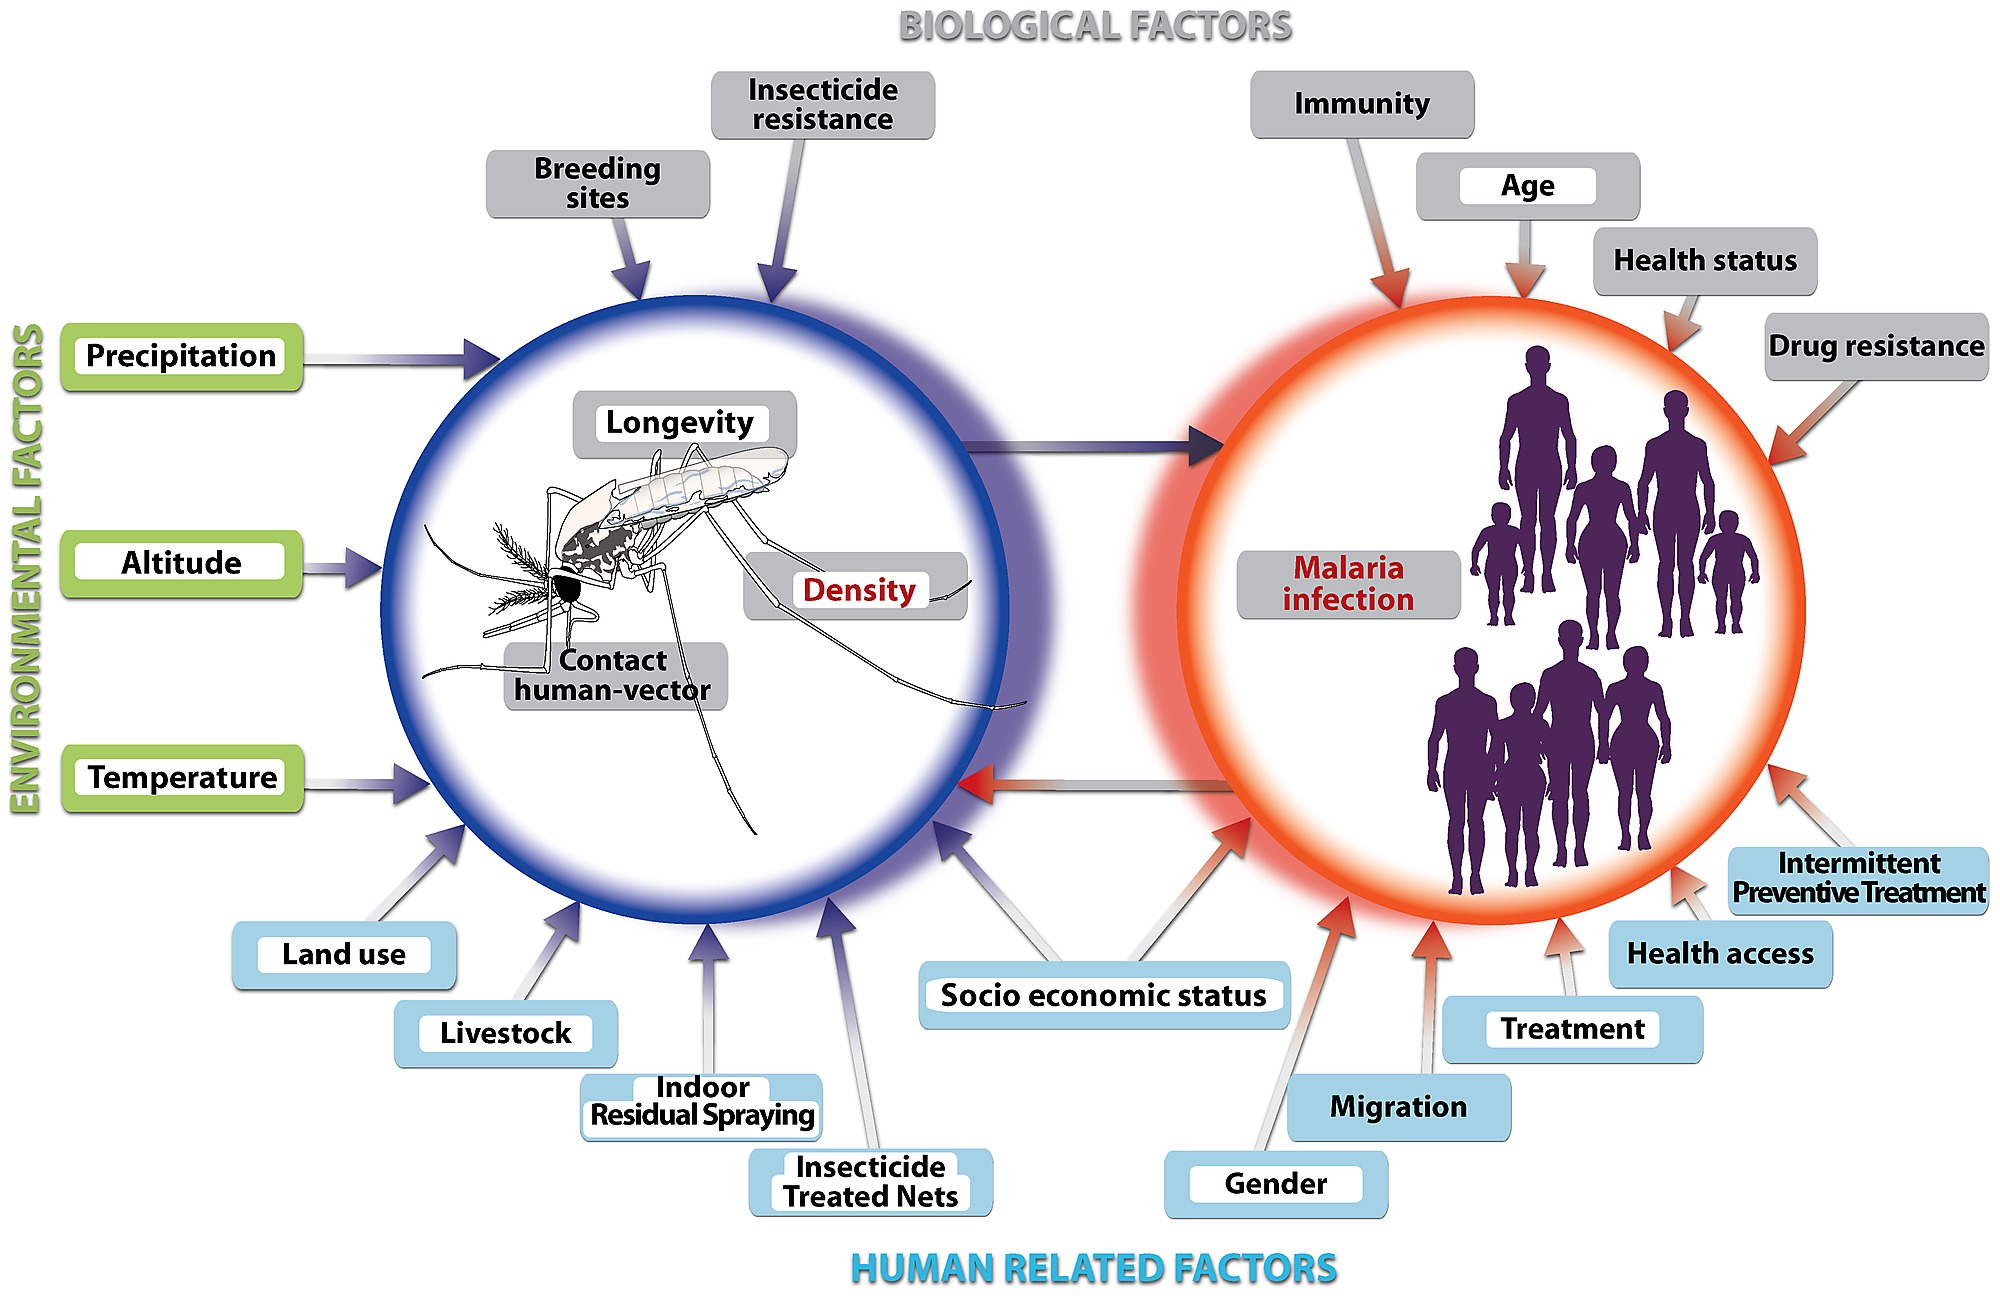 Environmental Factors As Important As >> Conceptual Model Of Important Risk Factors Affecting Malaria